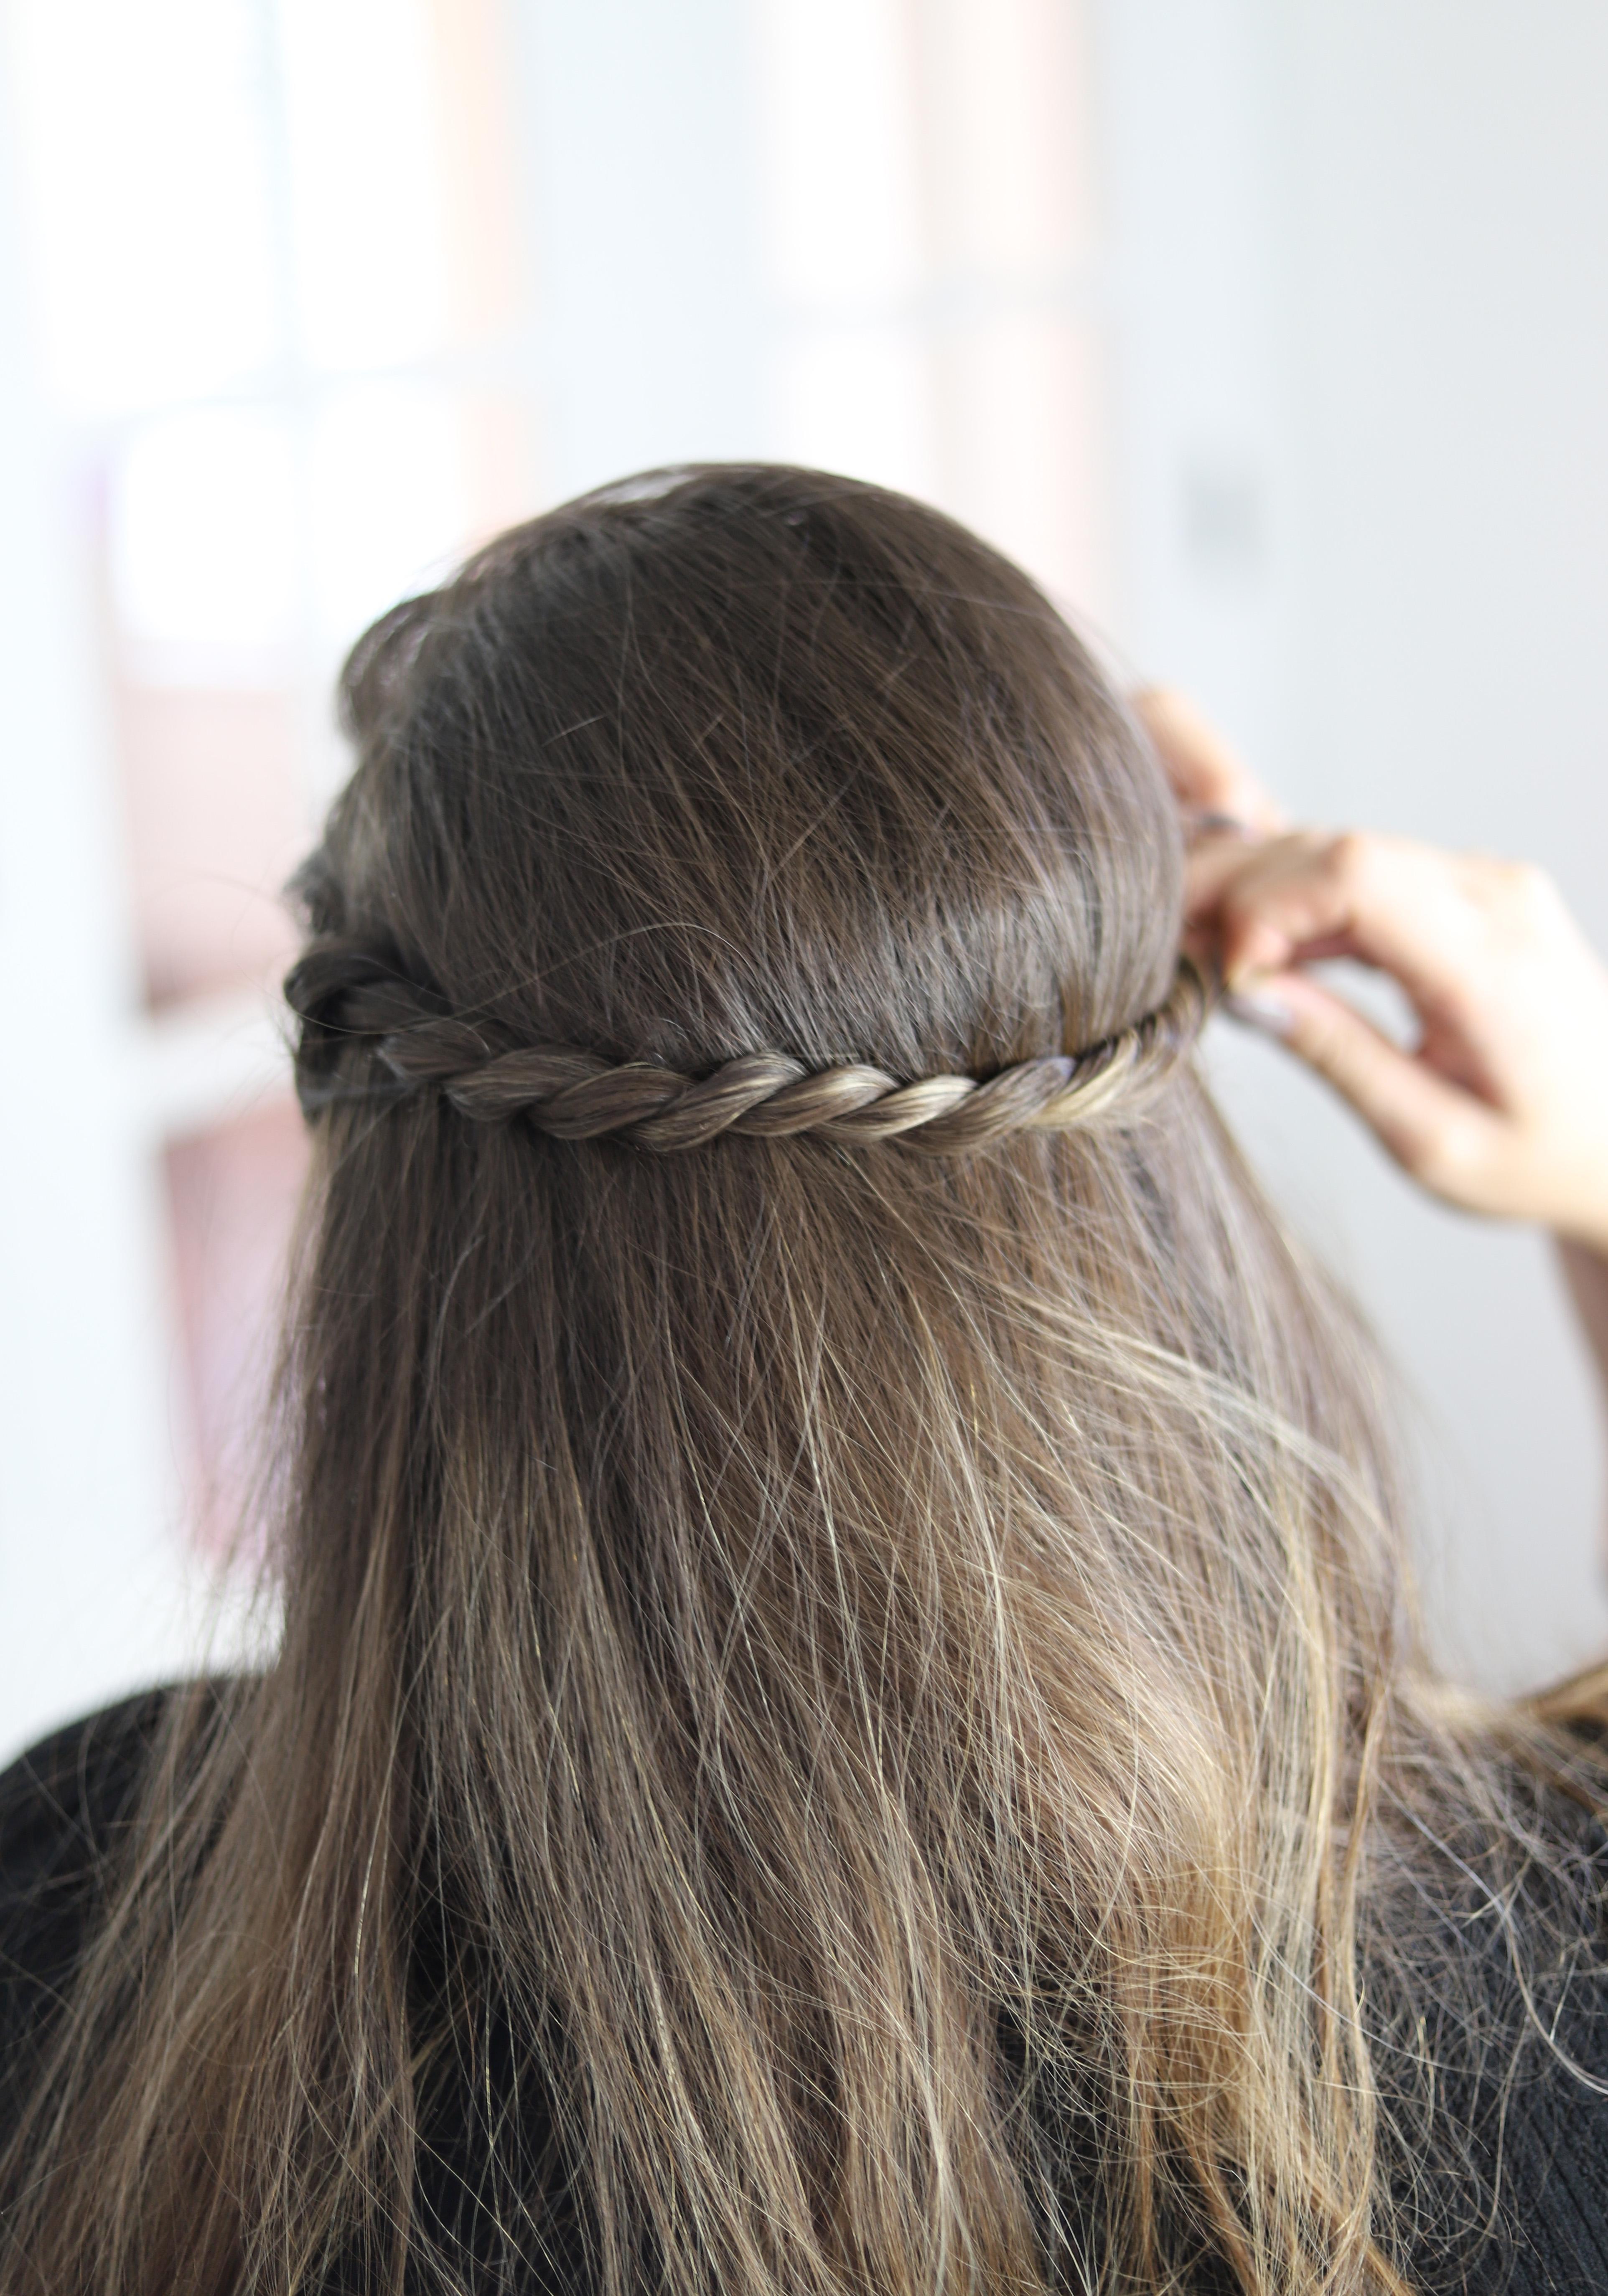 Mash elle beauty blogger | hairstyle | hair tutorial | Pantene | hair braid style | fall hairstyles | hair inspiration